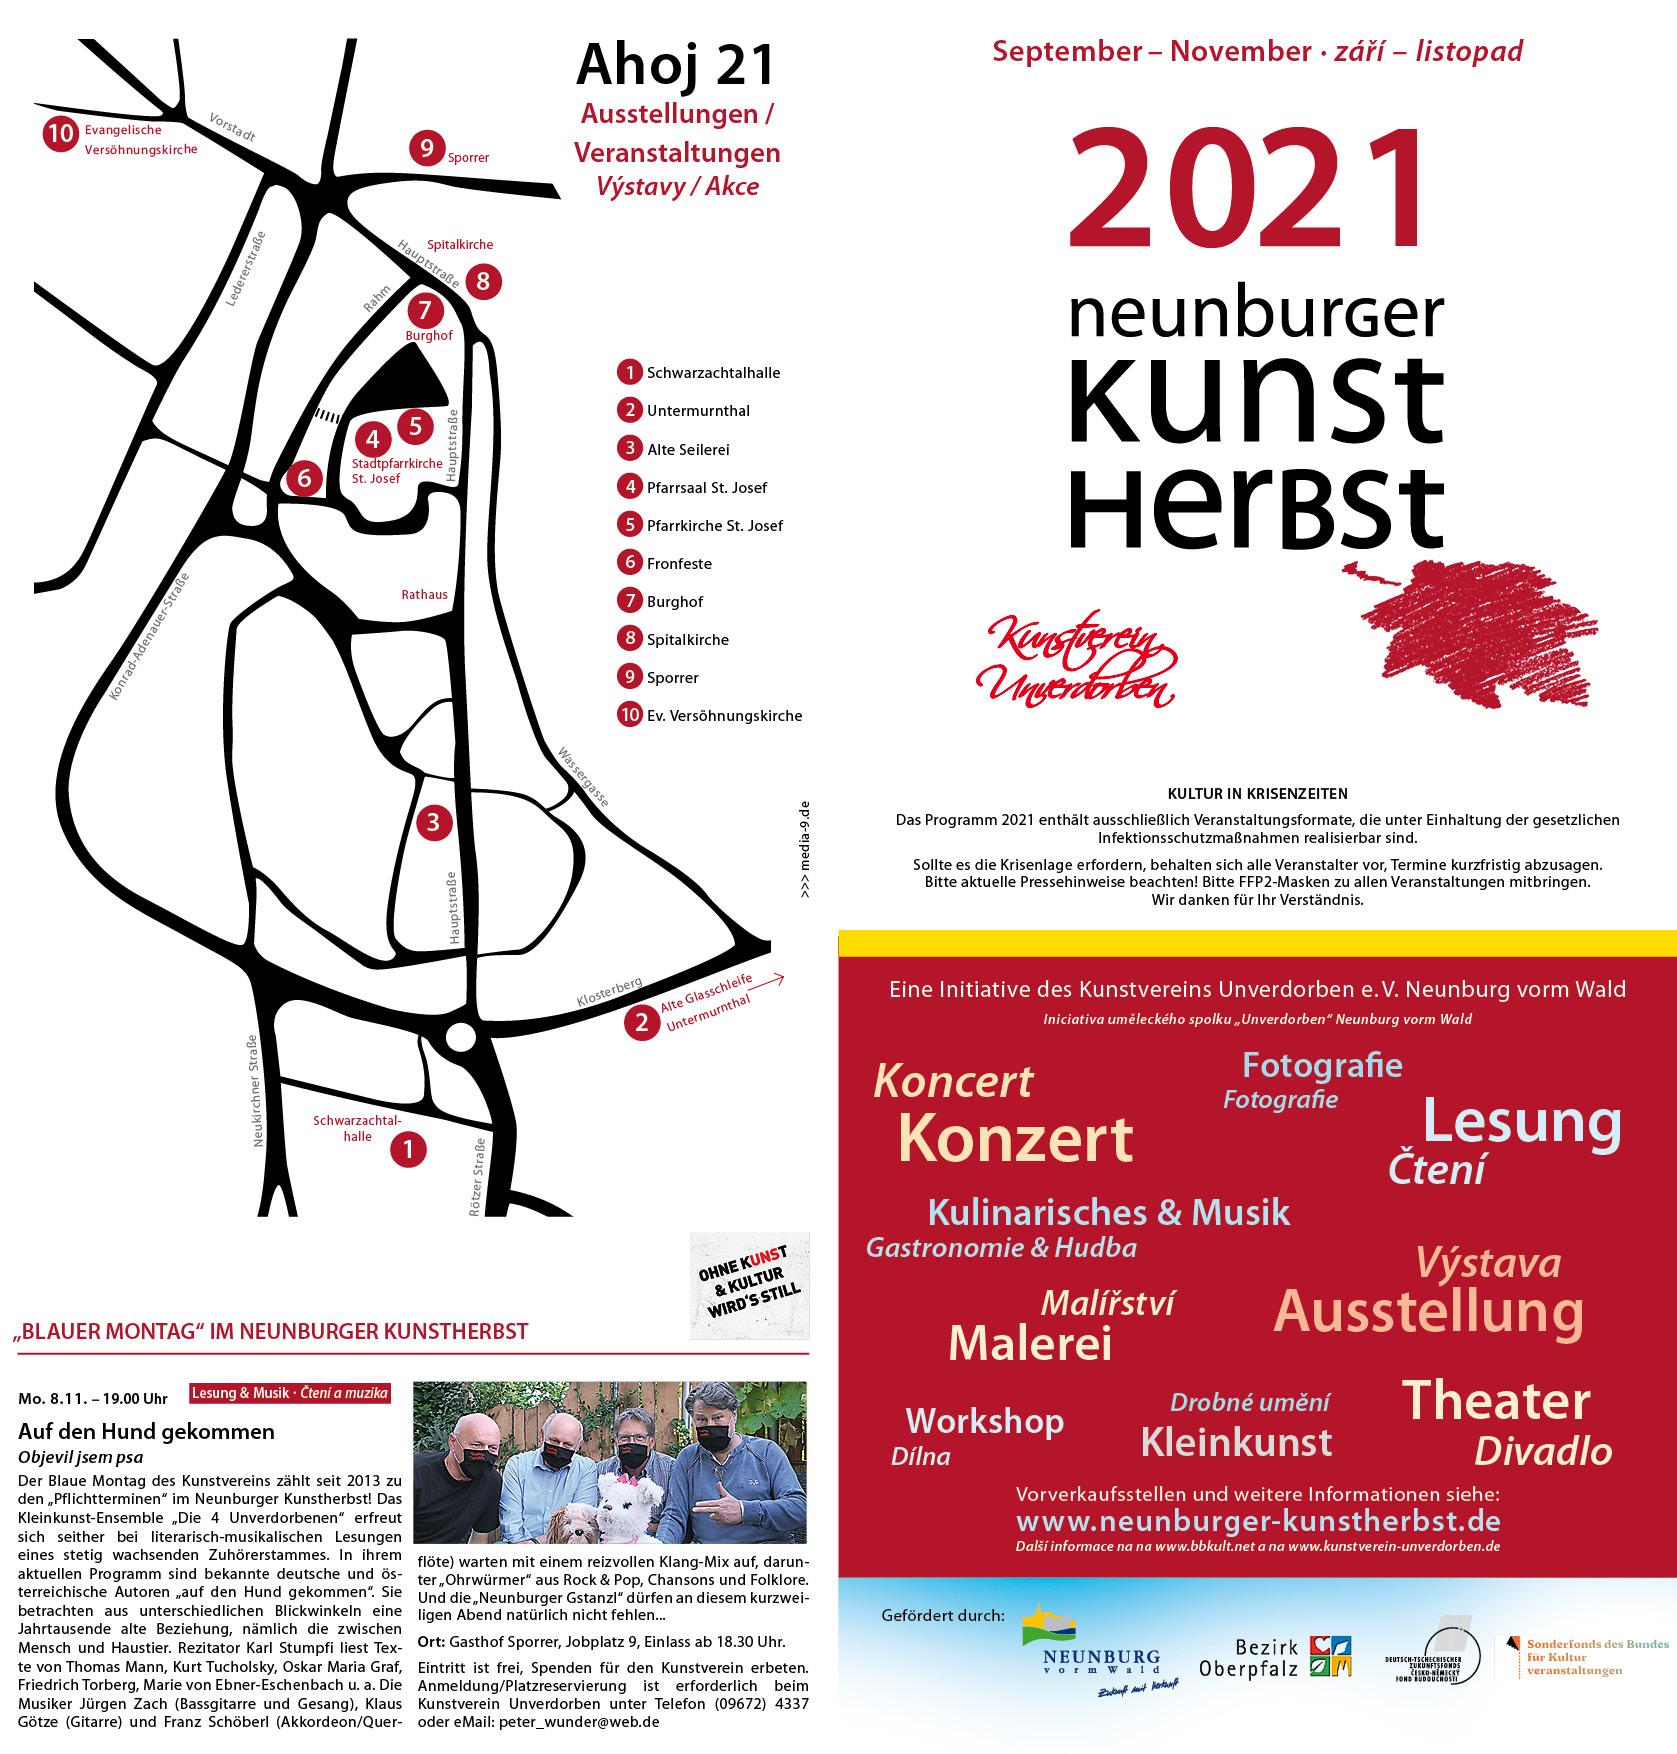 FOLKunstherbst2021-12-01